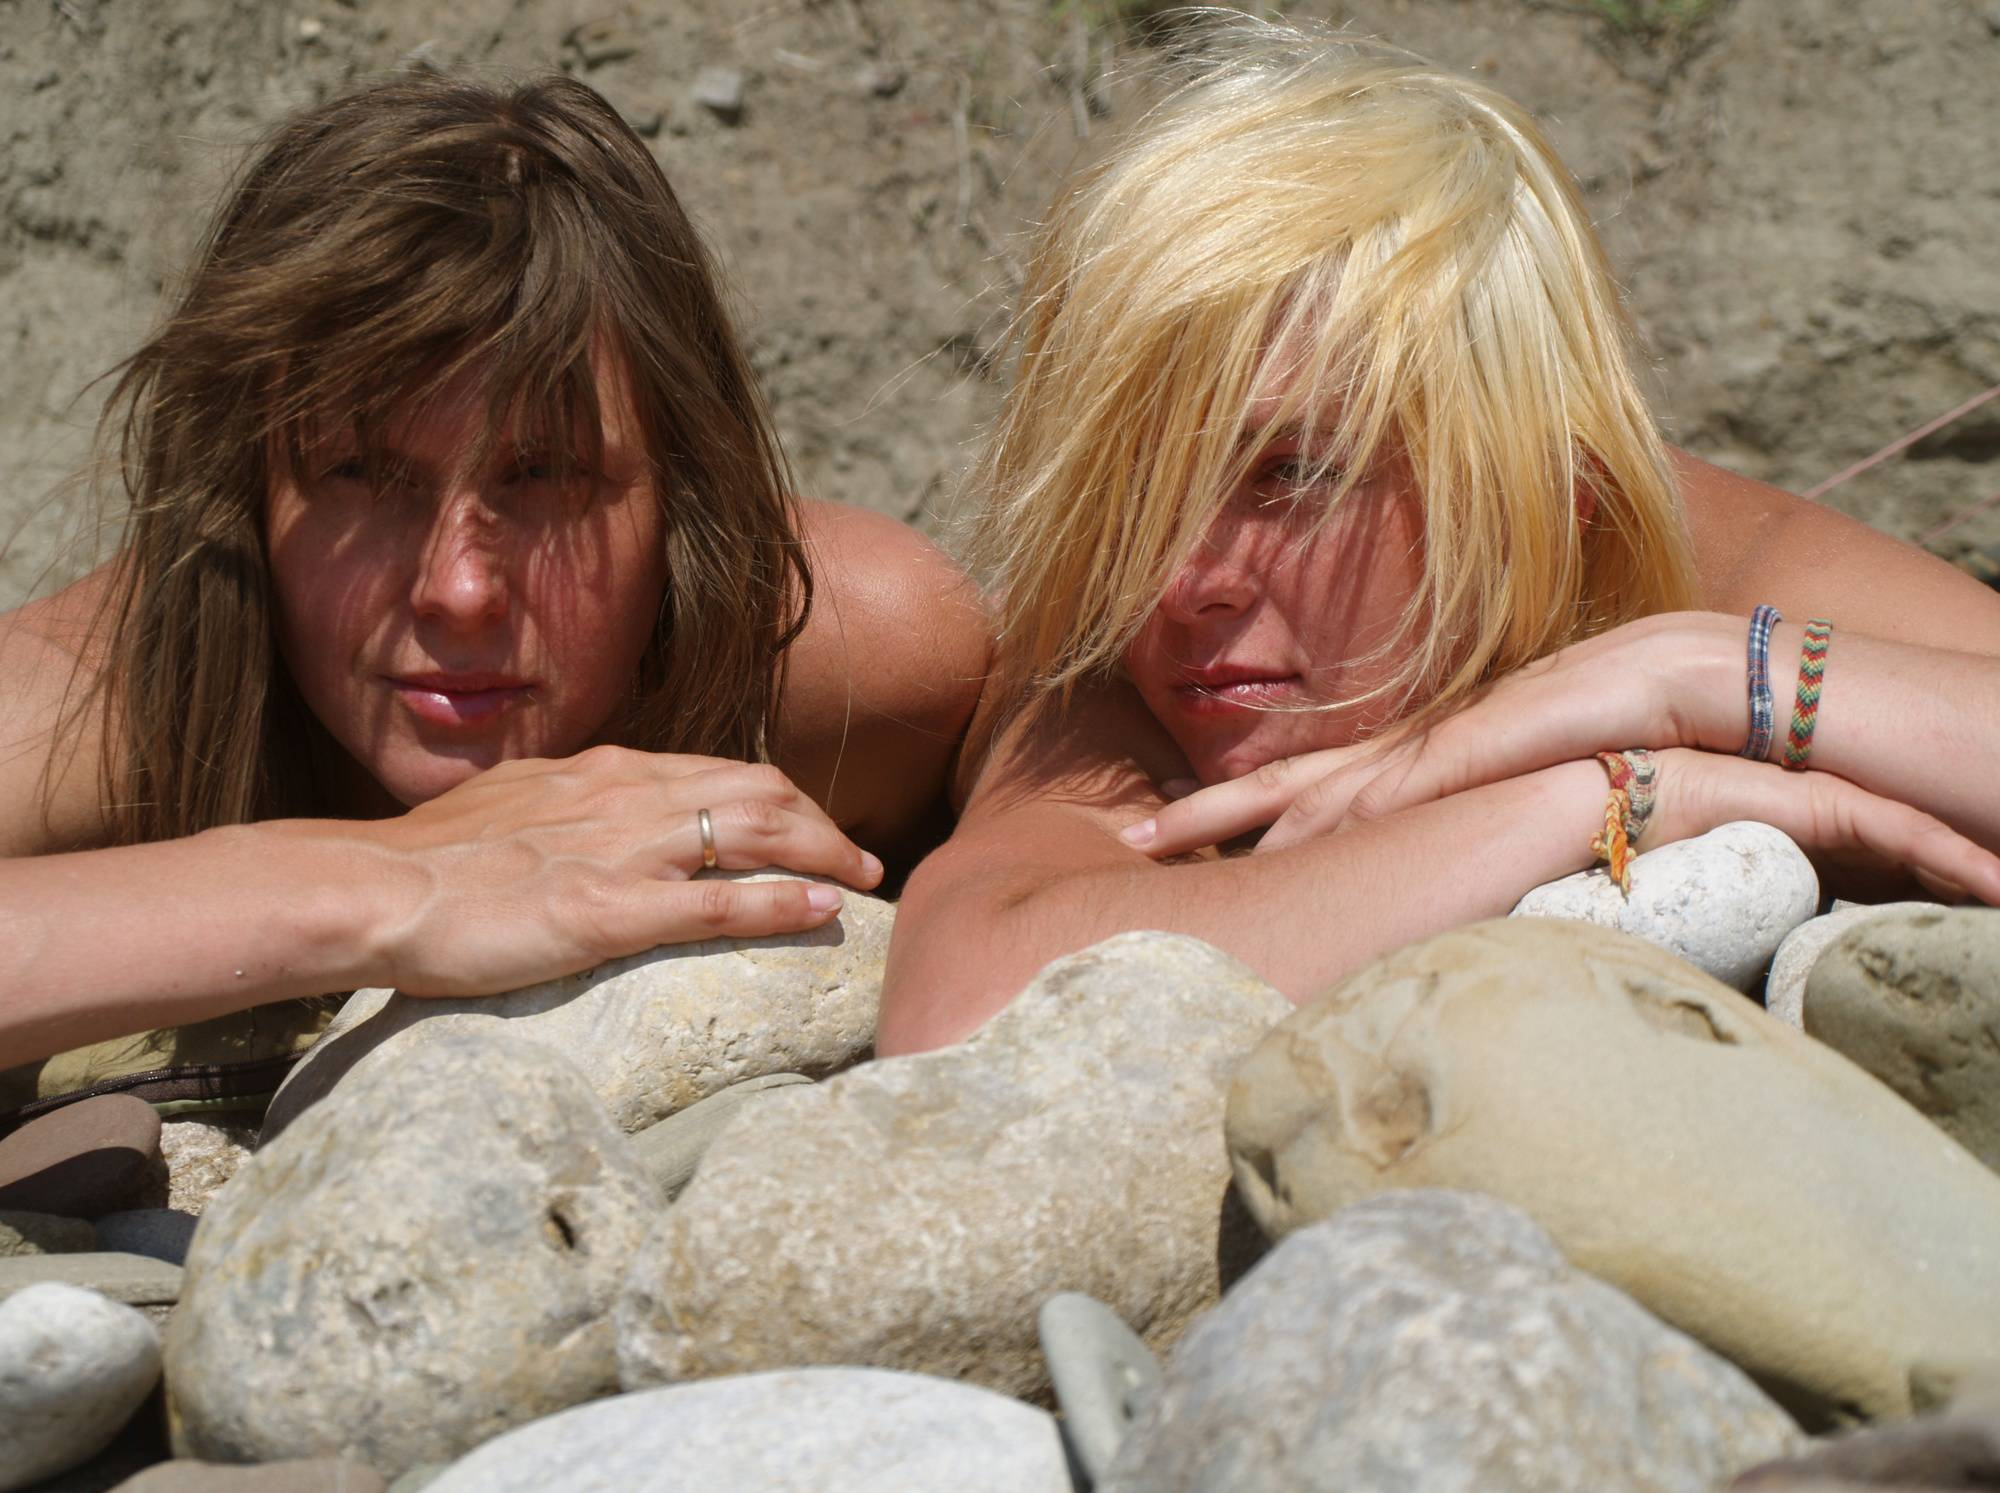 Purenudism Pics-Blonde Beach Rock Beauty - 1